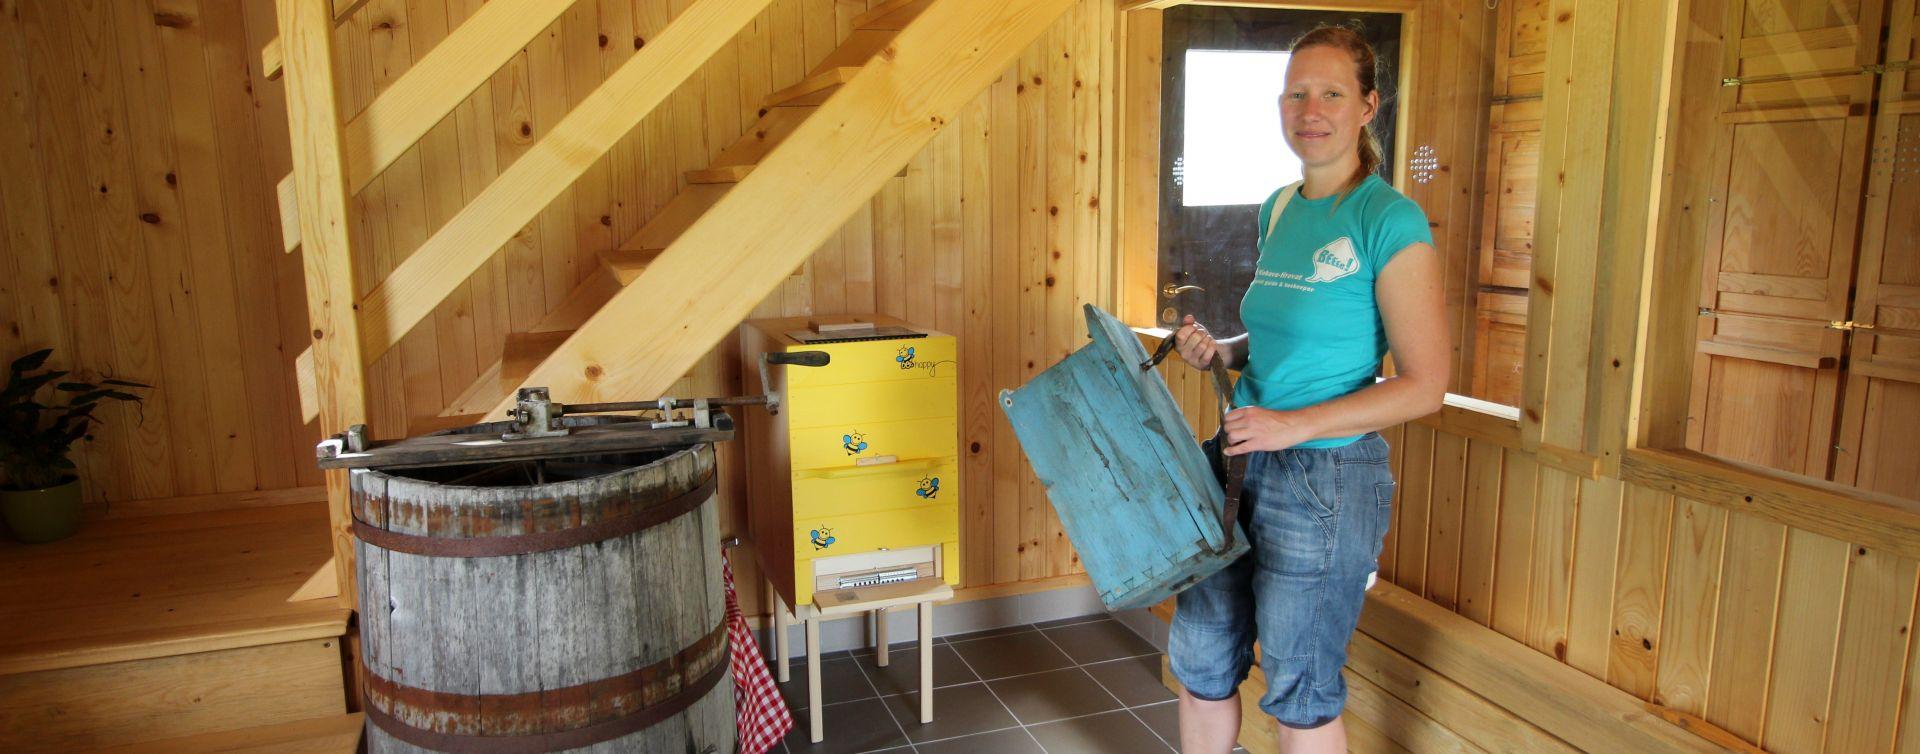 Beekeeper Soča valley Slovenia